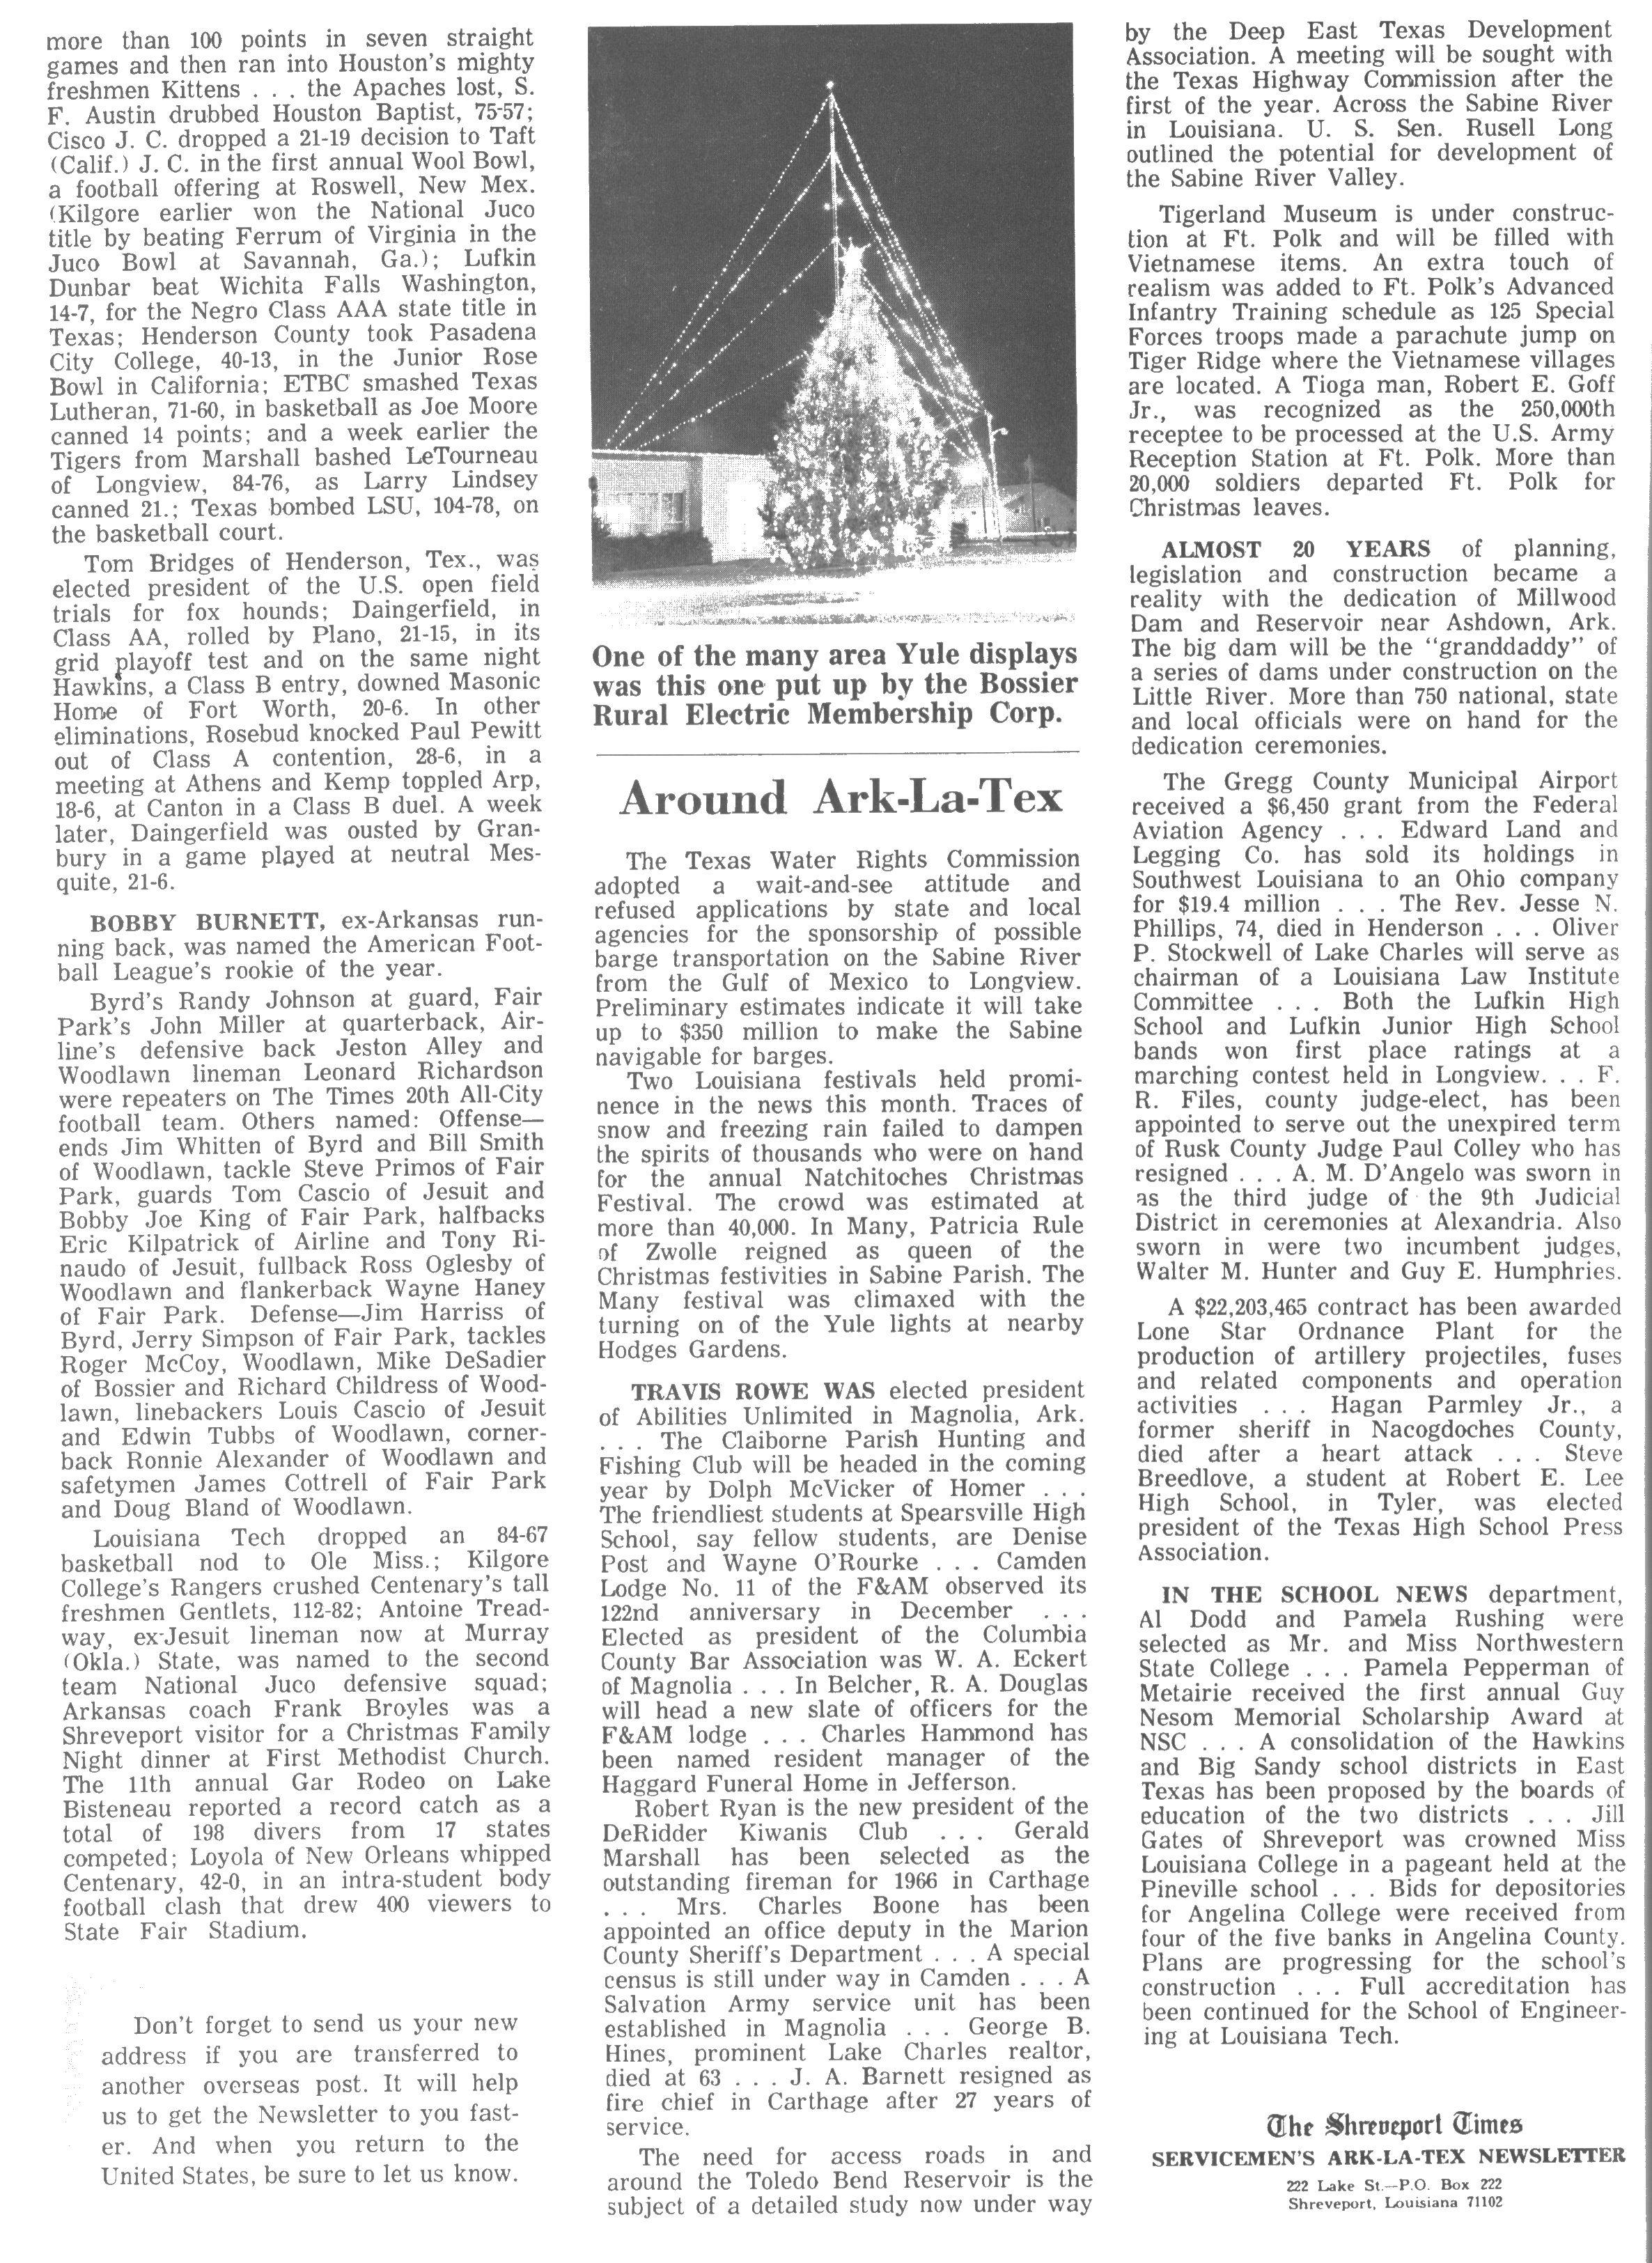 http://www.japrime.com/cols/newsletter-1966-12-04.jpg